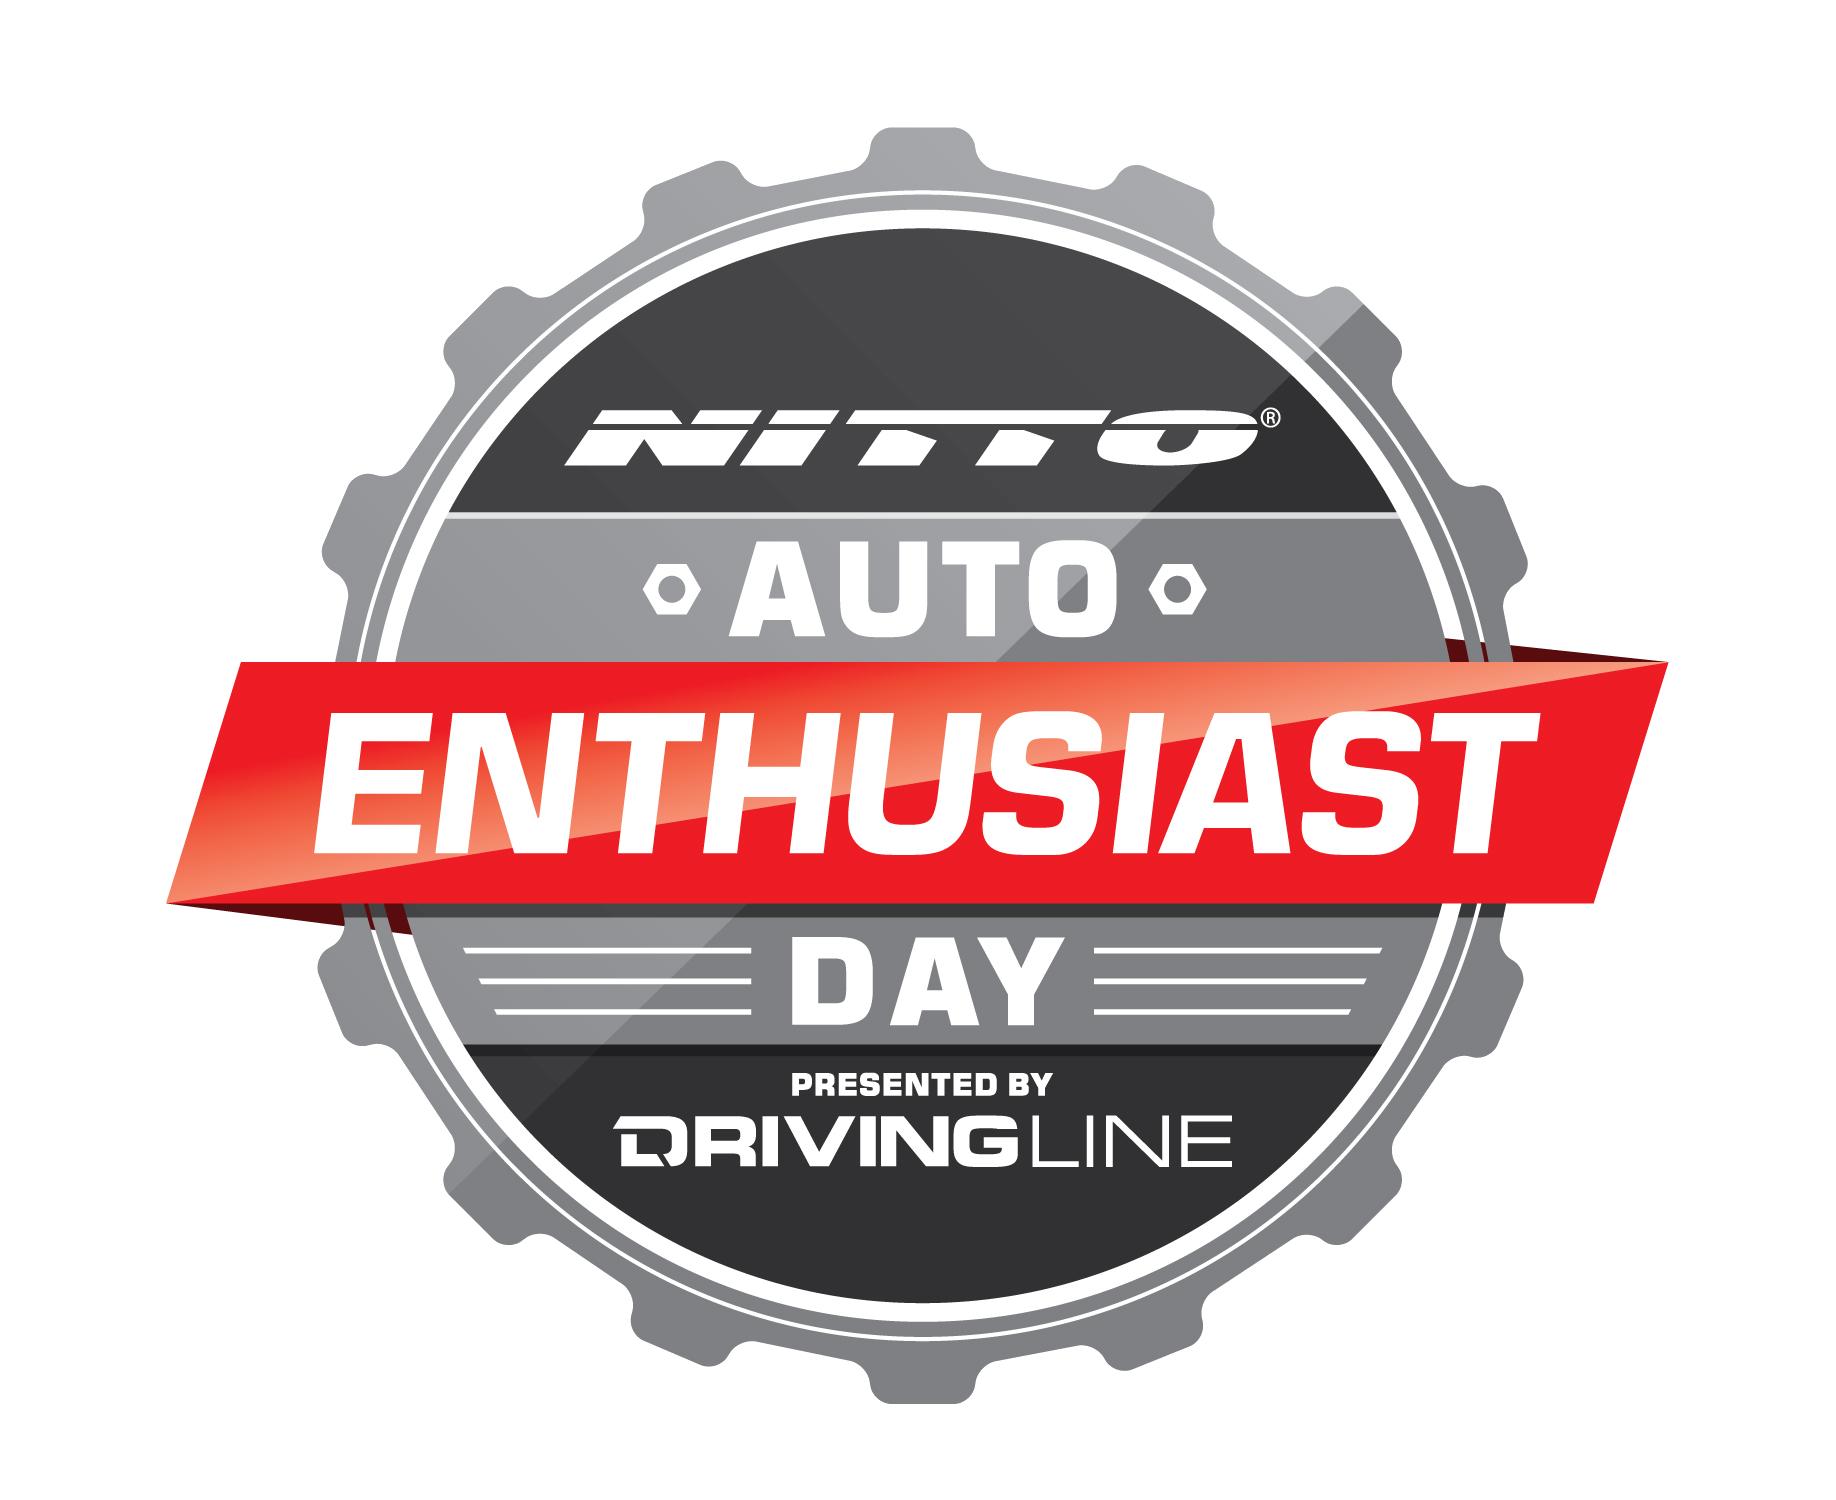 LiveAt: California Auto Enthusiast Day 2016